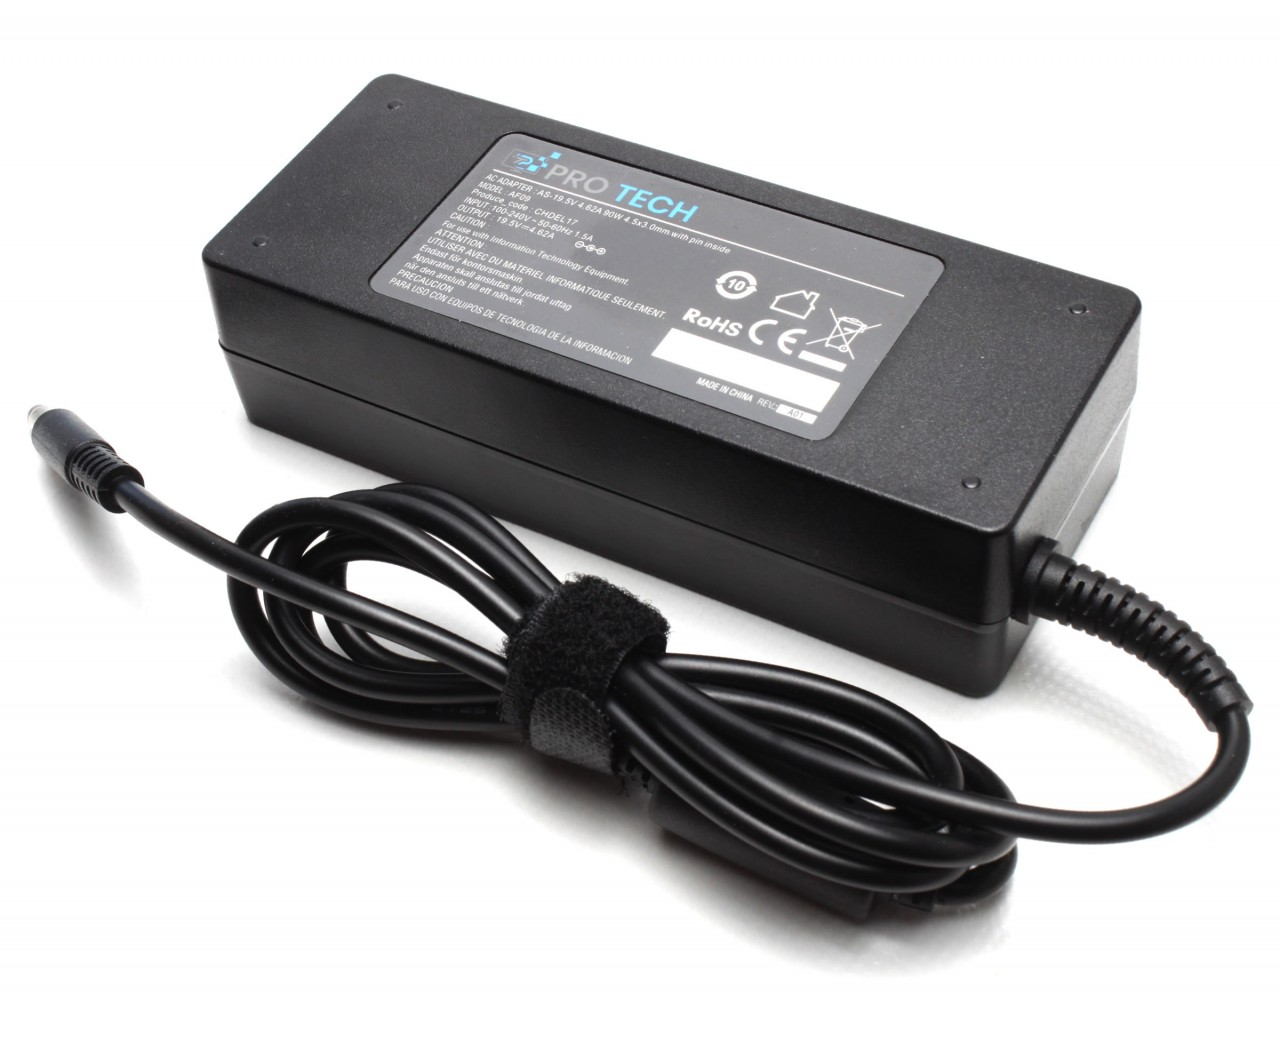 Incarcator Dell Vostro 3559 90W Replacement imagine powerlaptop.ro 2021